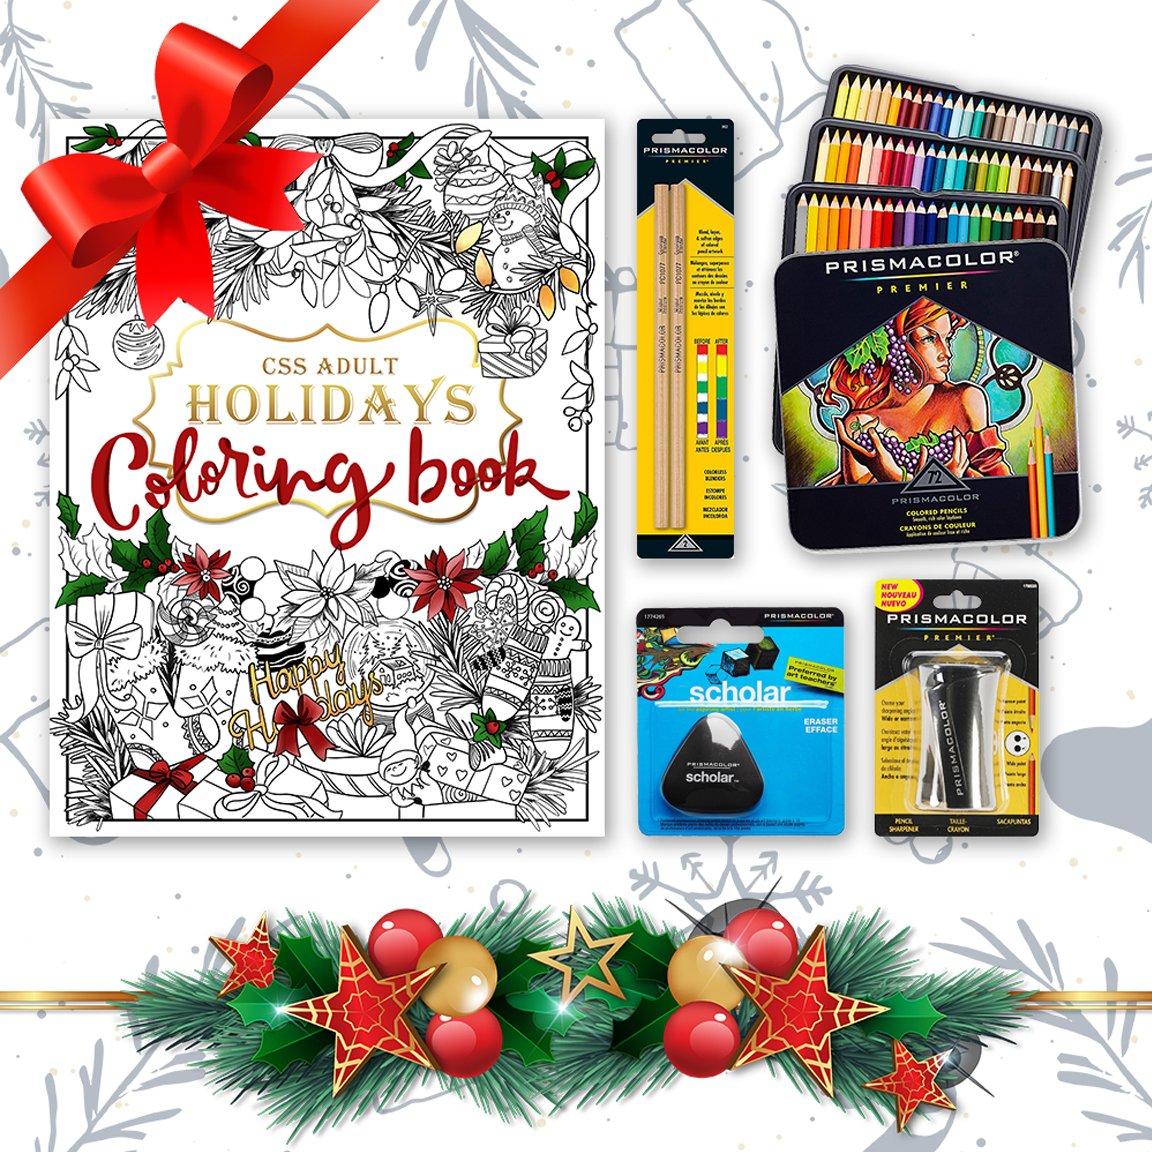 Prismacolor Bundle - 72-Count Colored Pencils, Triangular Scholar Pencil Eraser, Premier Pencil Sharpener, Colorless Blender Pencils, and CSS Adult Coloring Book